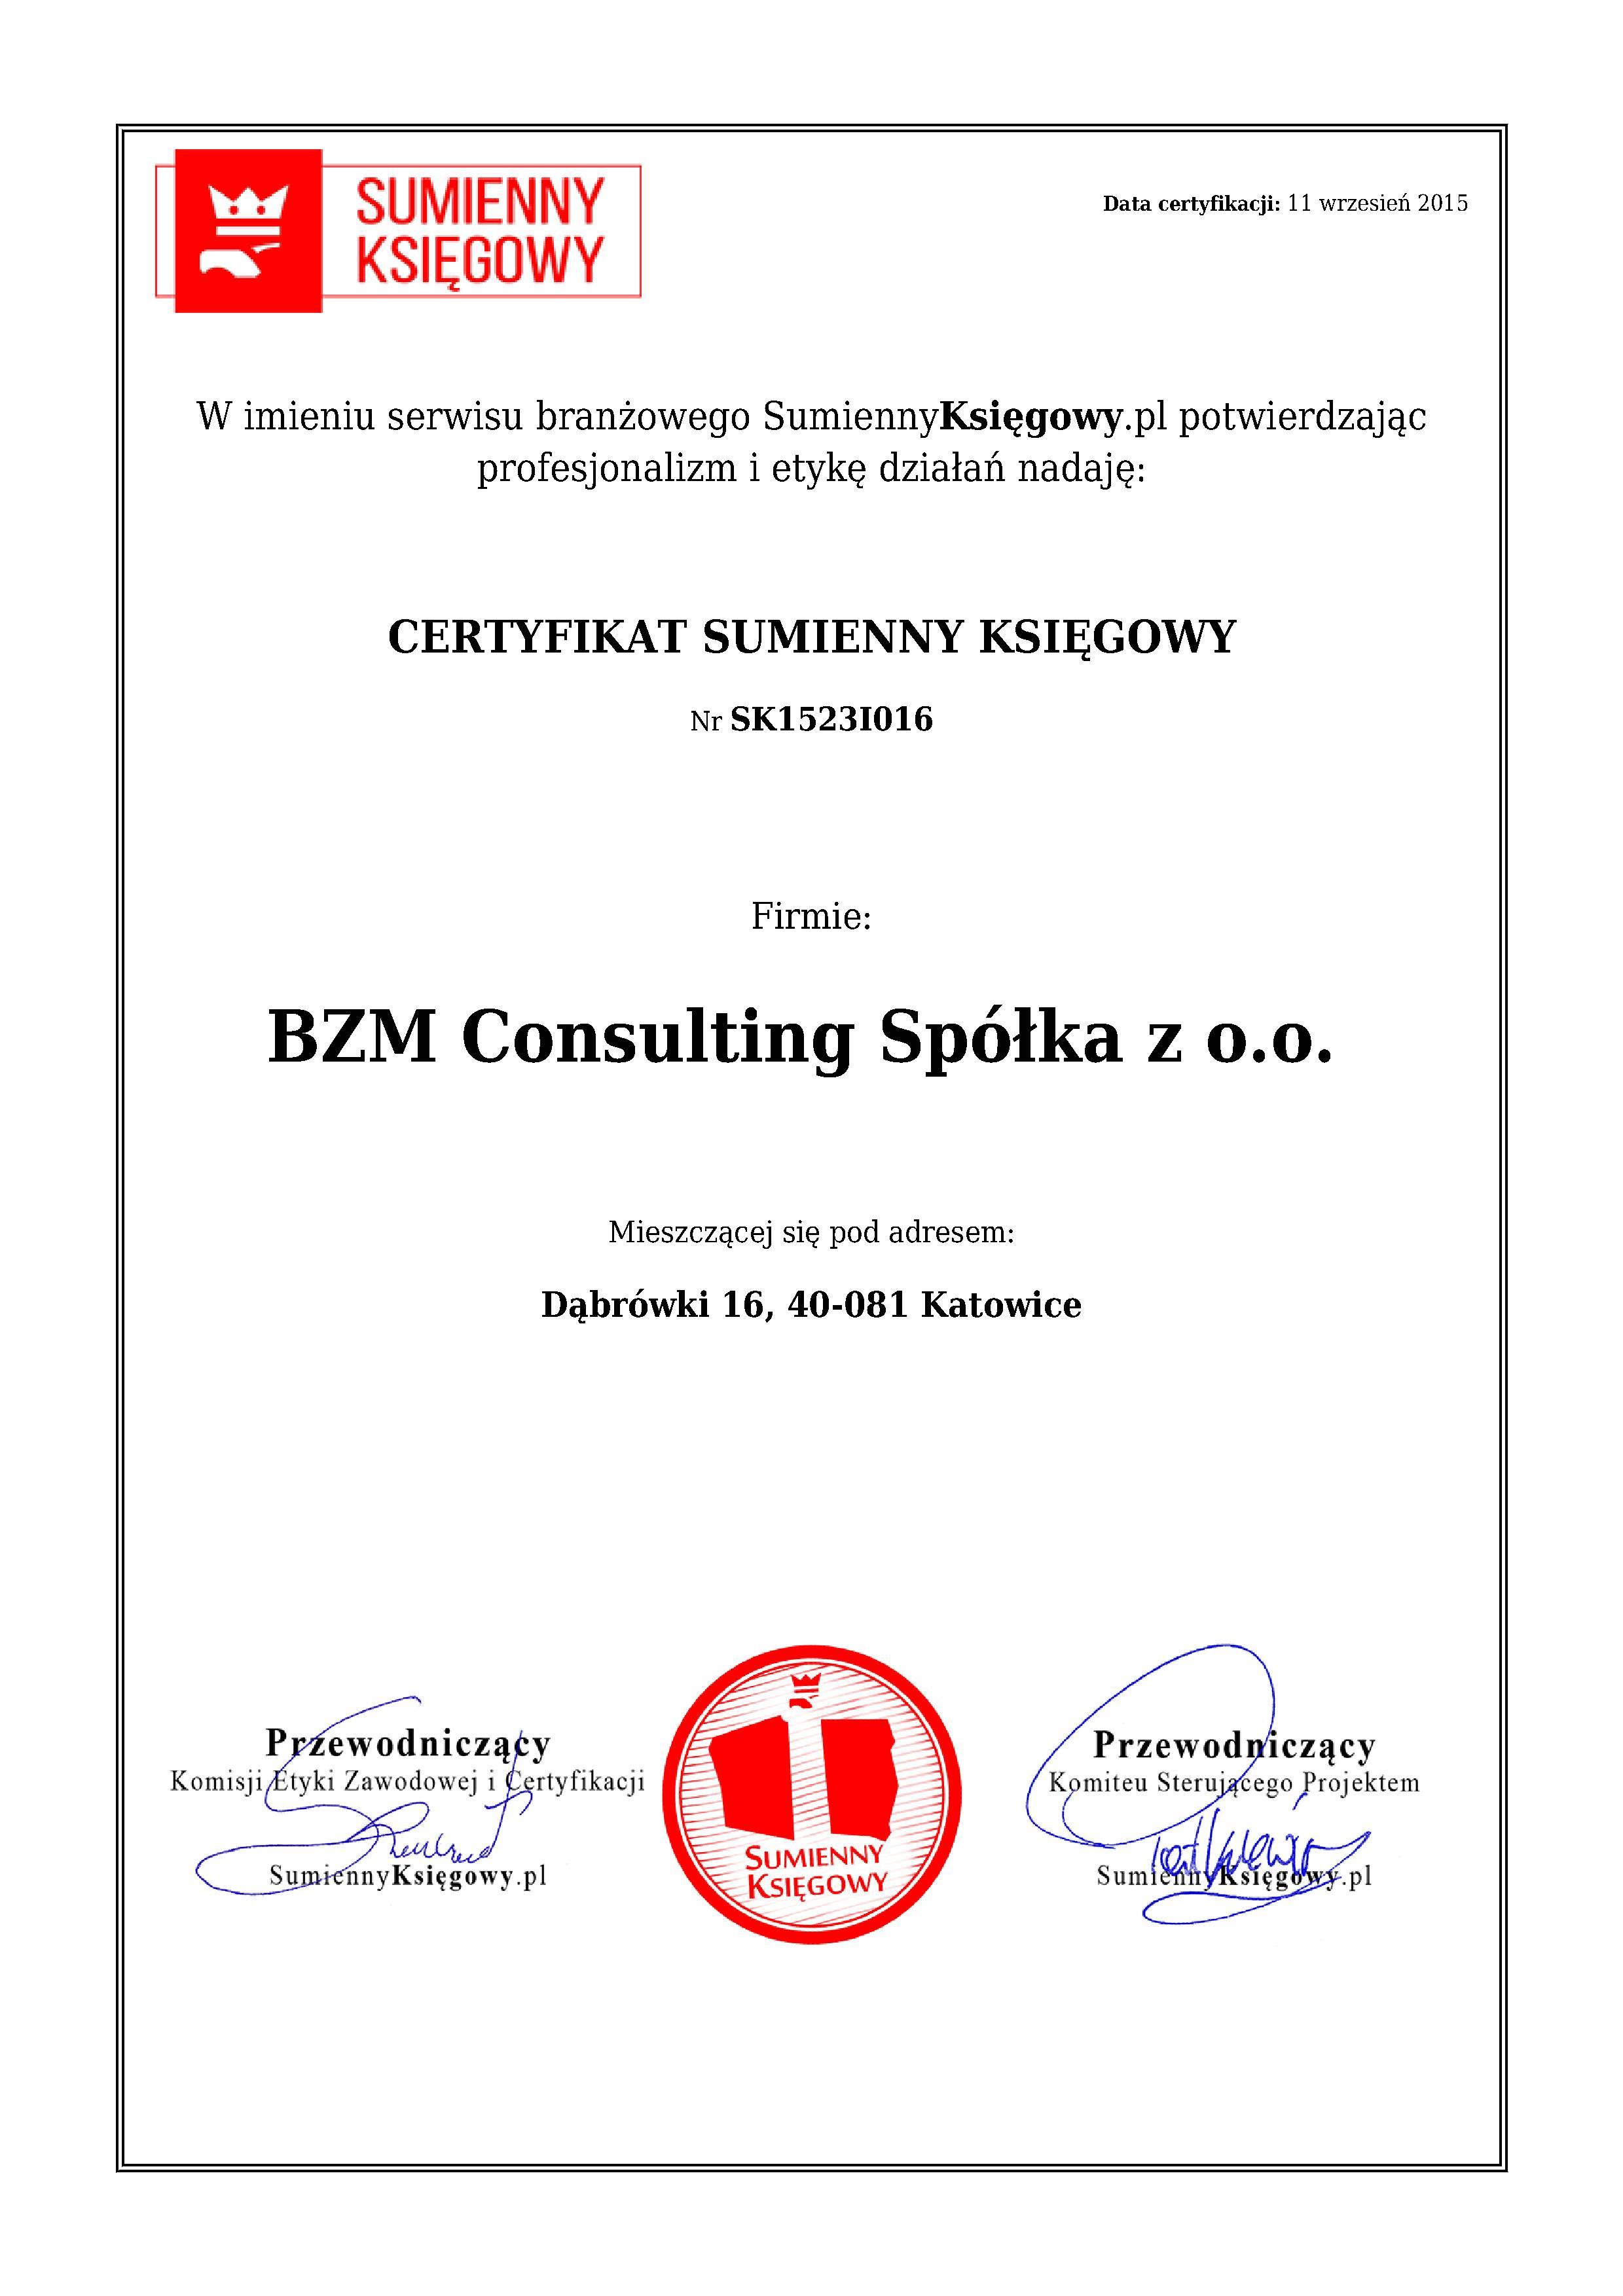 Certyfikat BZM Consulting Spółka z o.o.